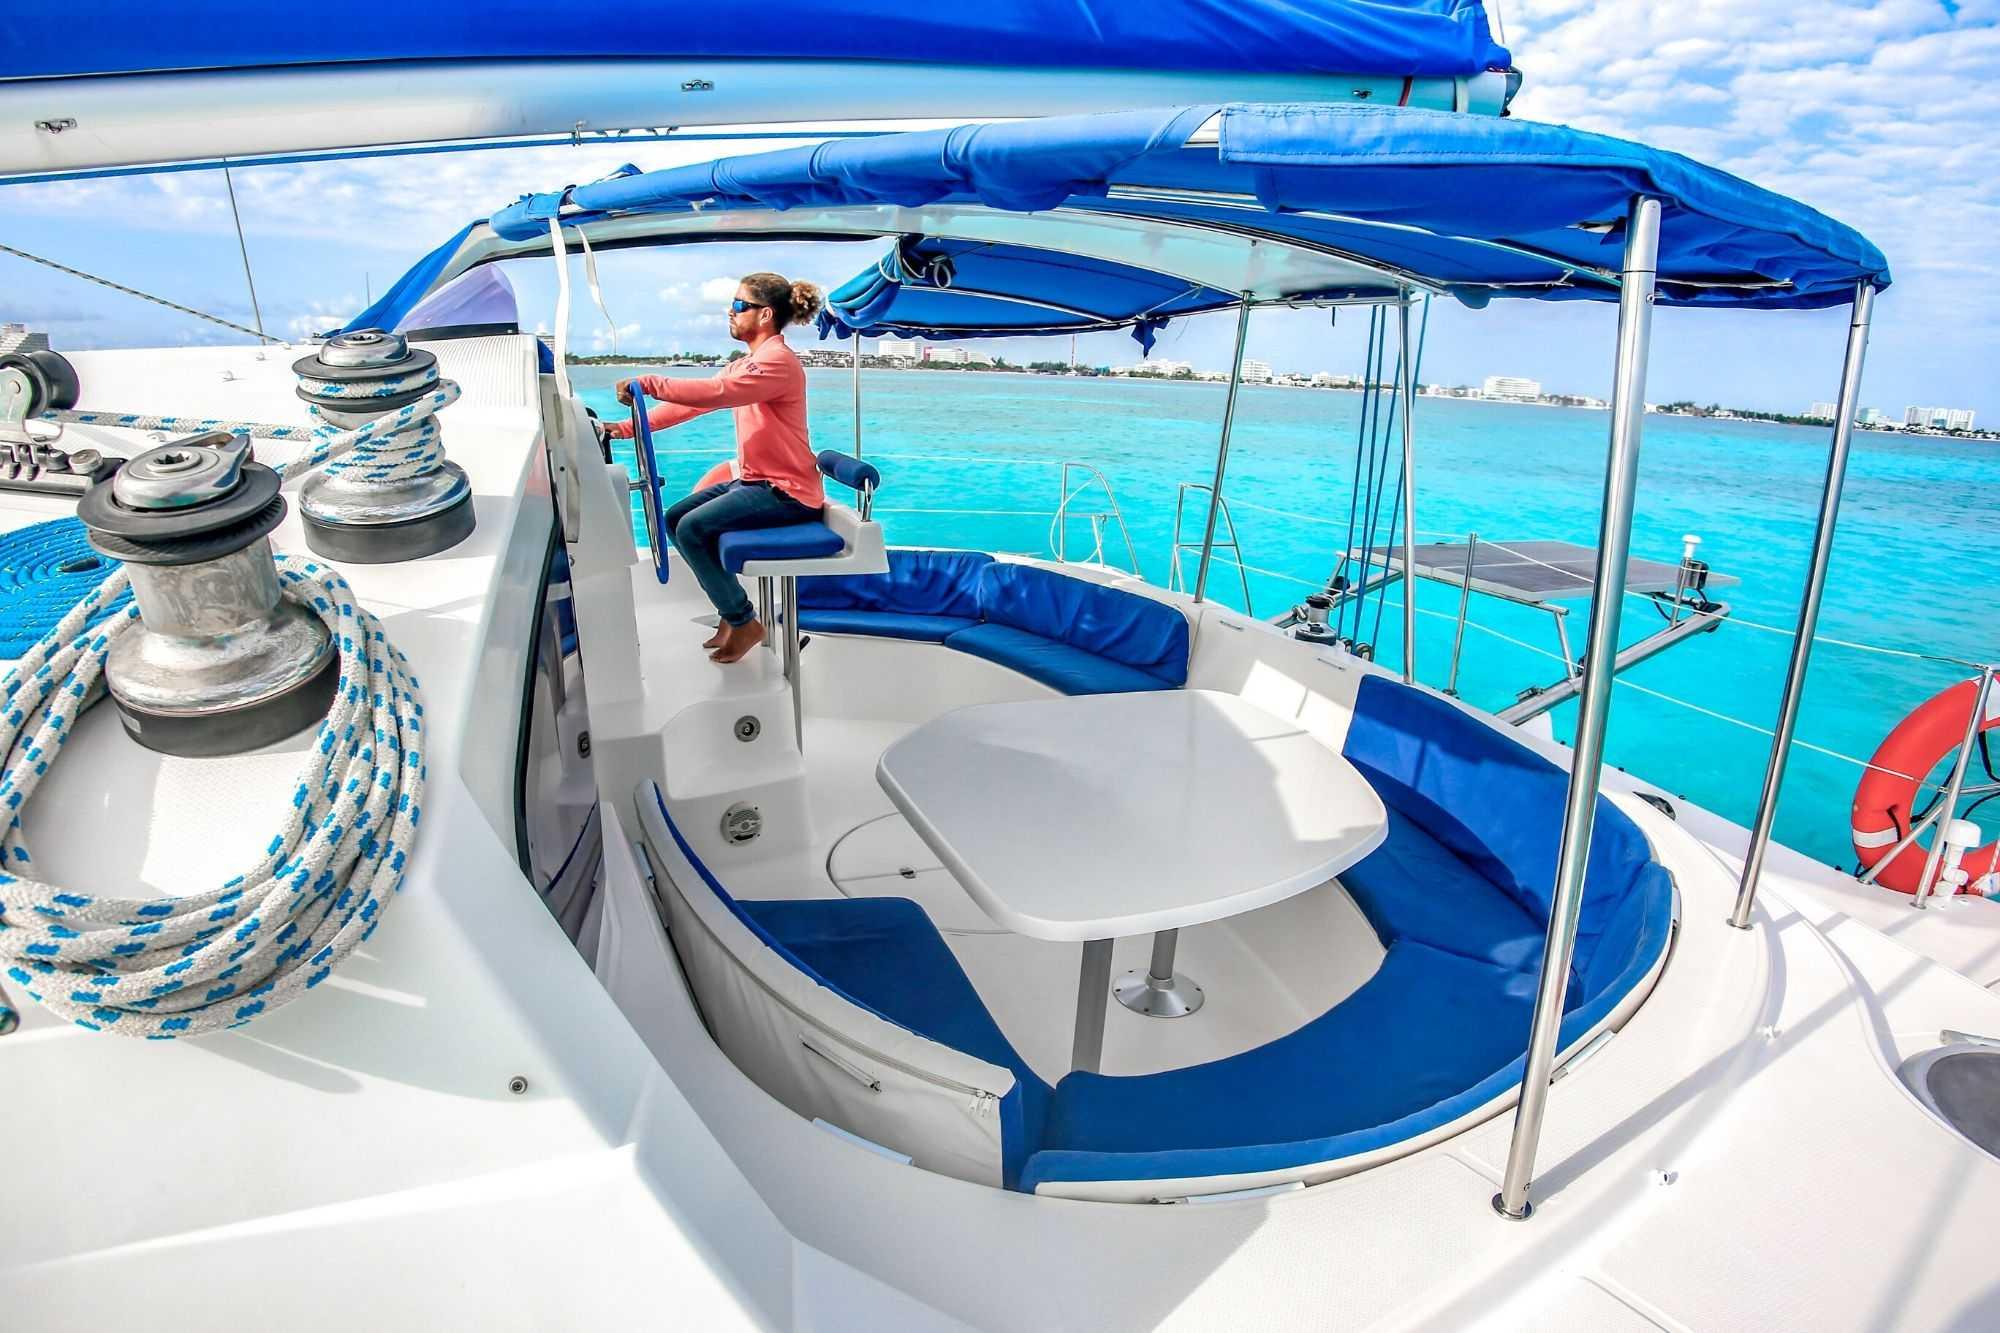 4 Vents - Isla Mujeres Catamaran Tour - Cancun Sailing 3